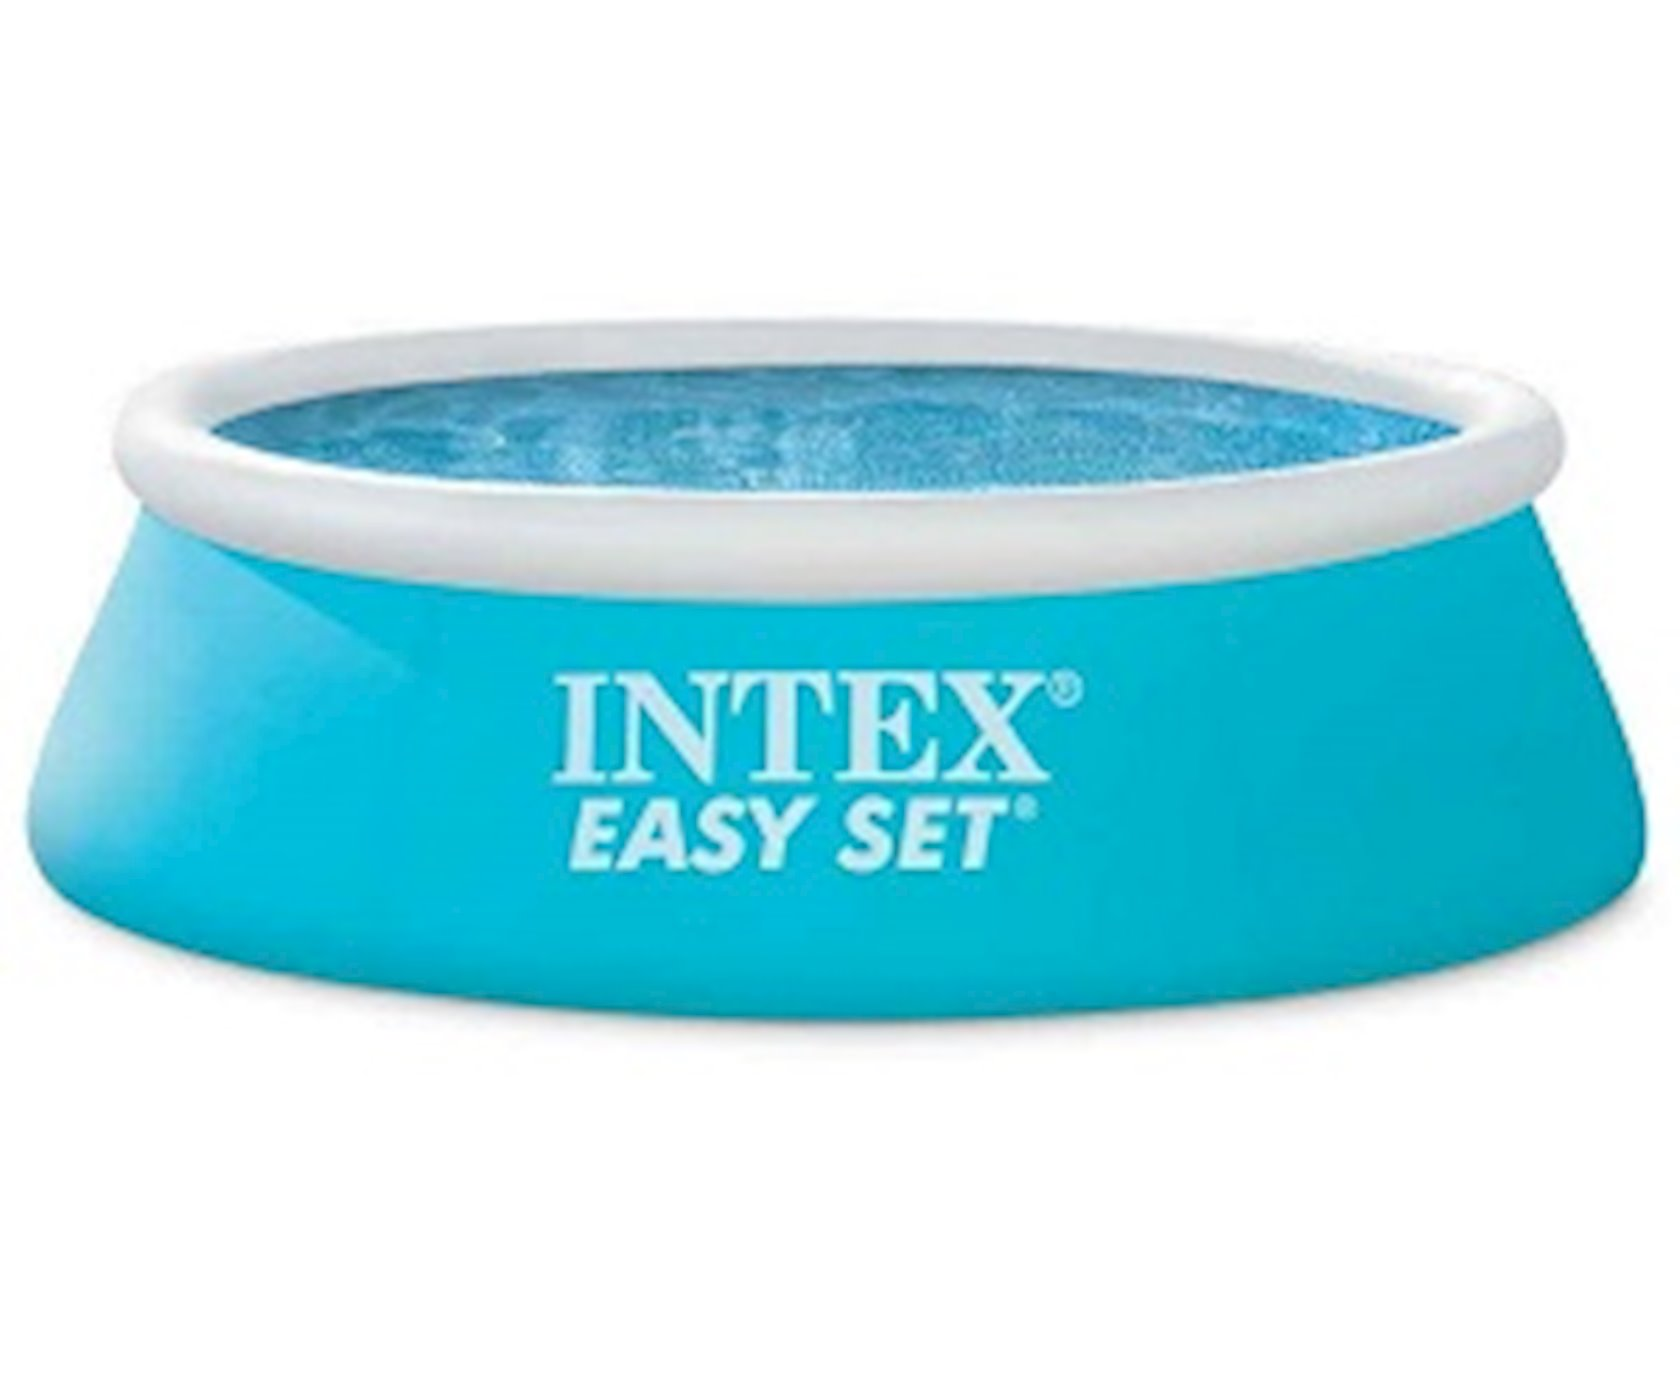 Hovuz Intex Easy Set, 183х51 sm, Göy, 886 l, 3.35 kq